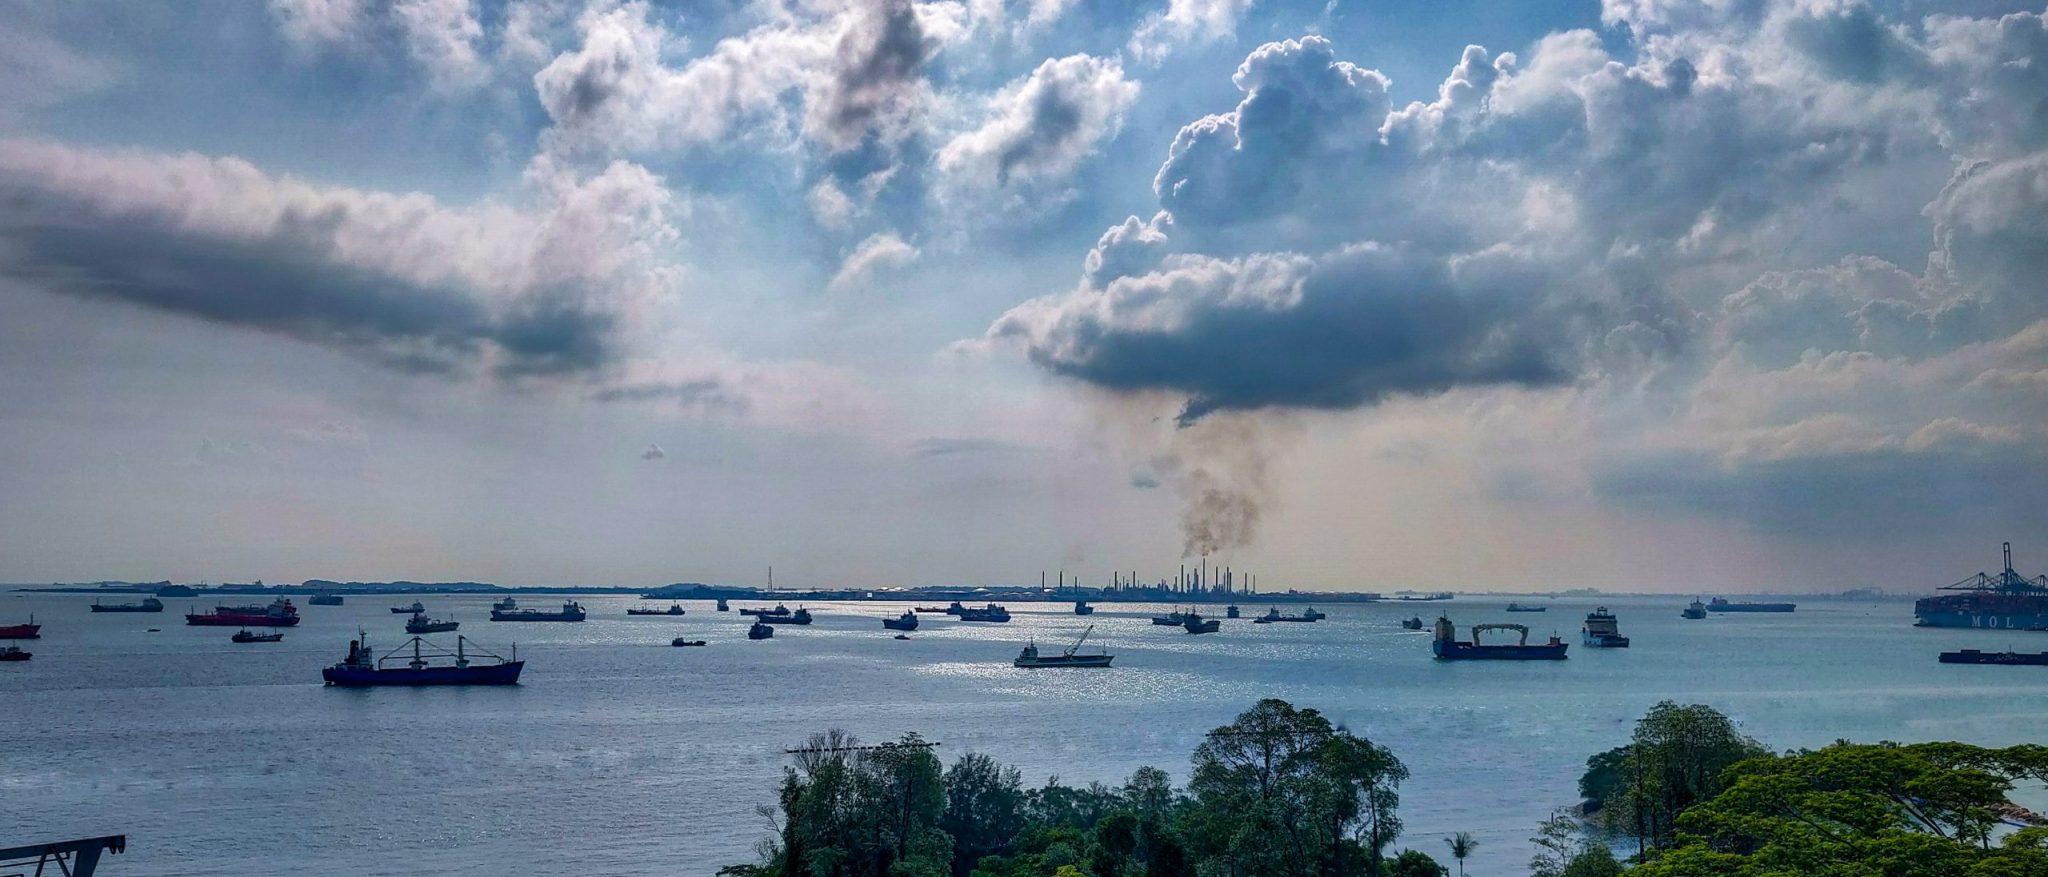 Sentosa Shipyard